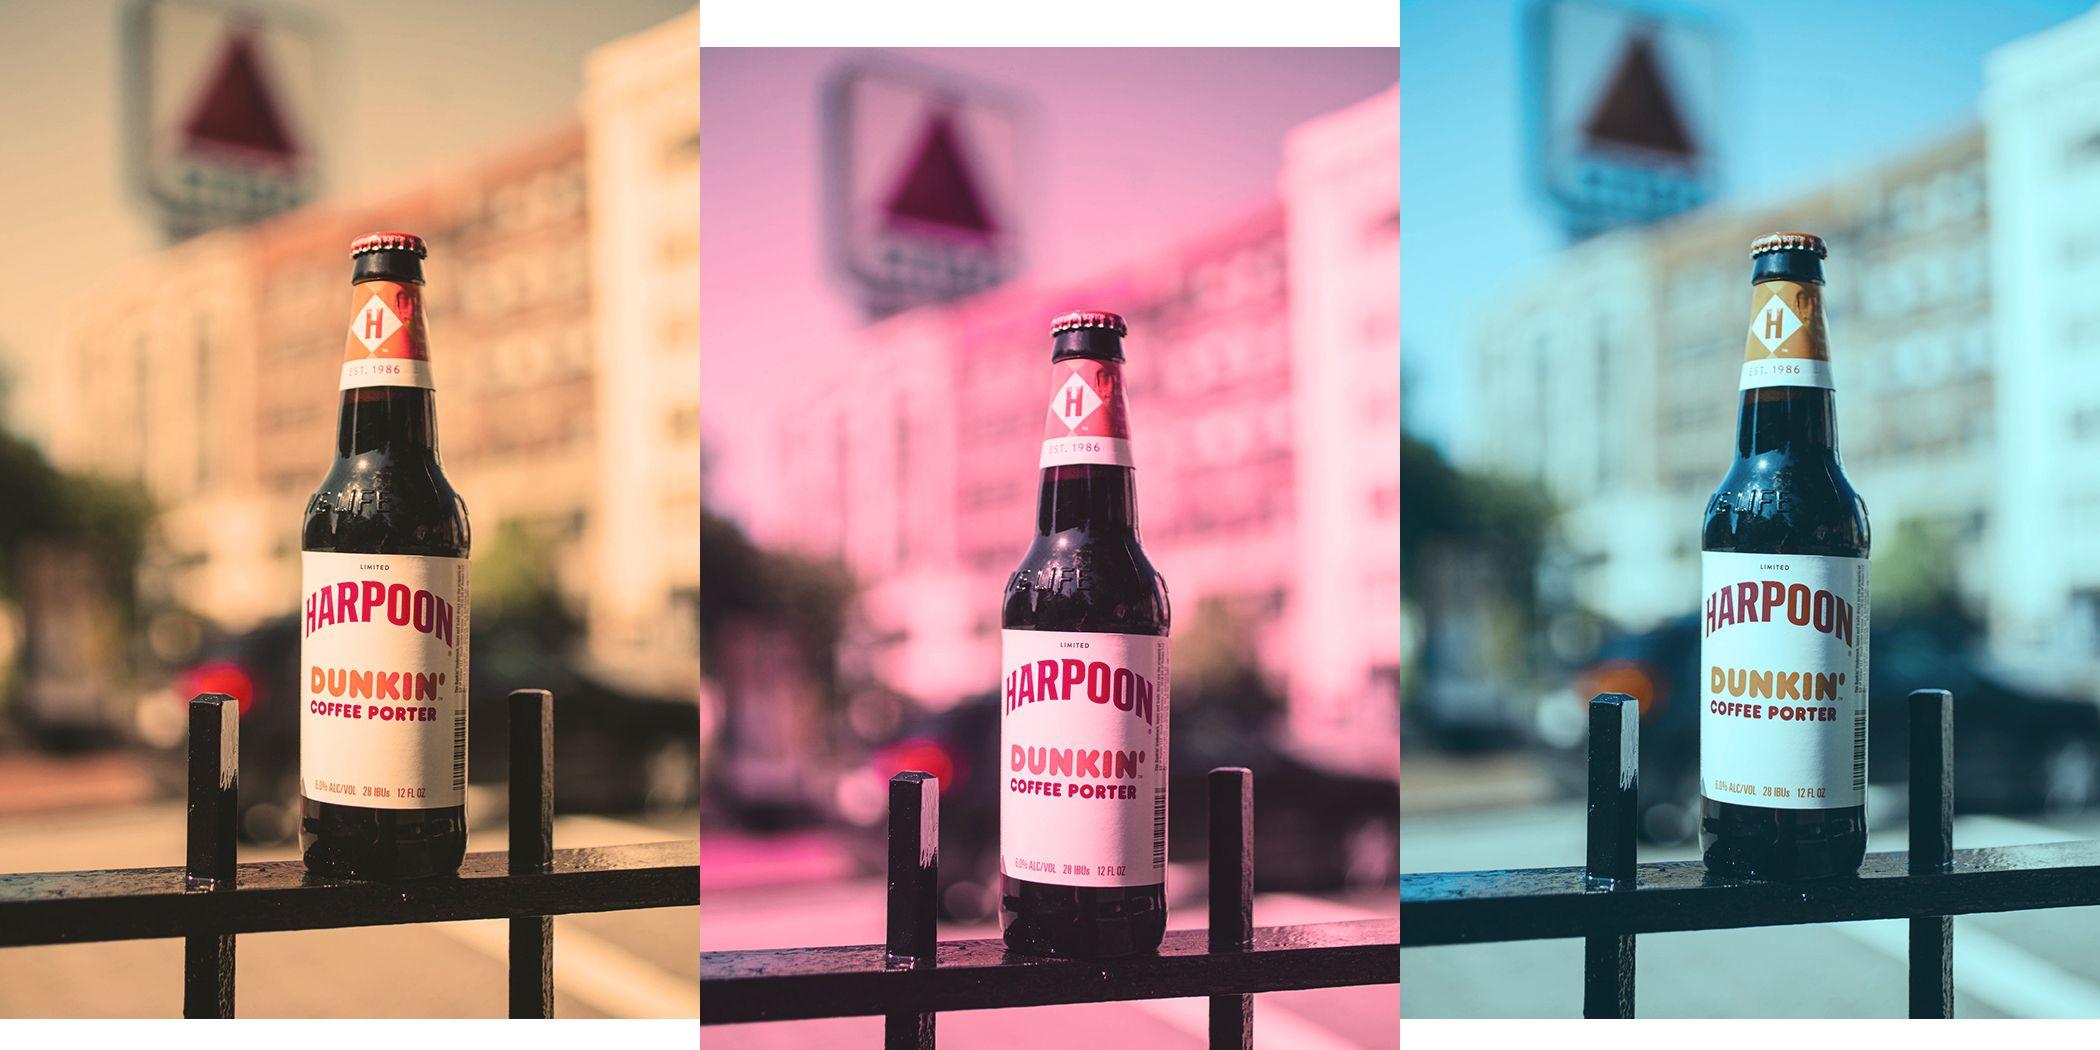 Harpoon's Dunkin Coffee Porter